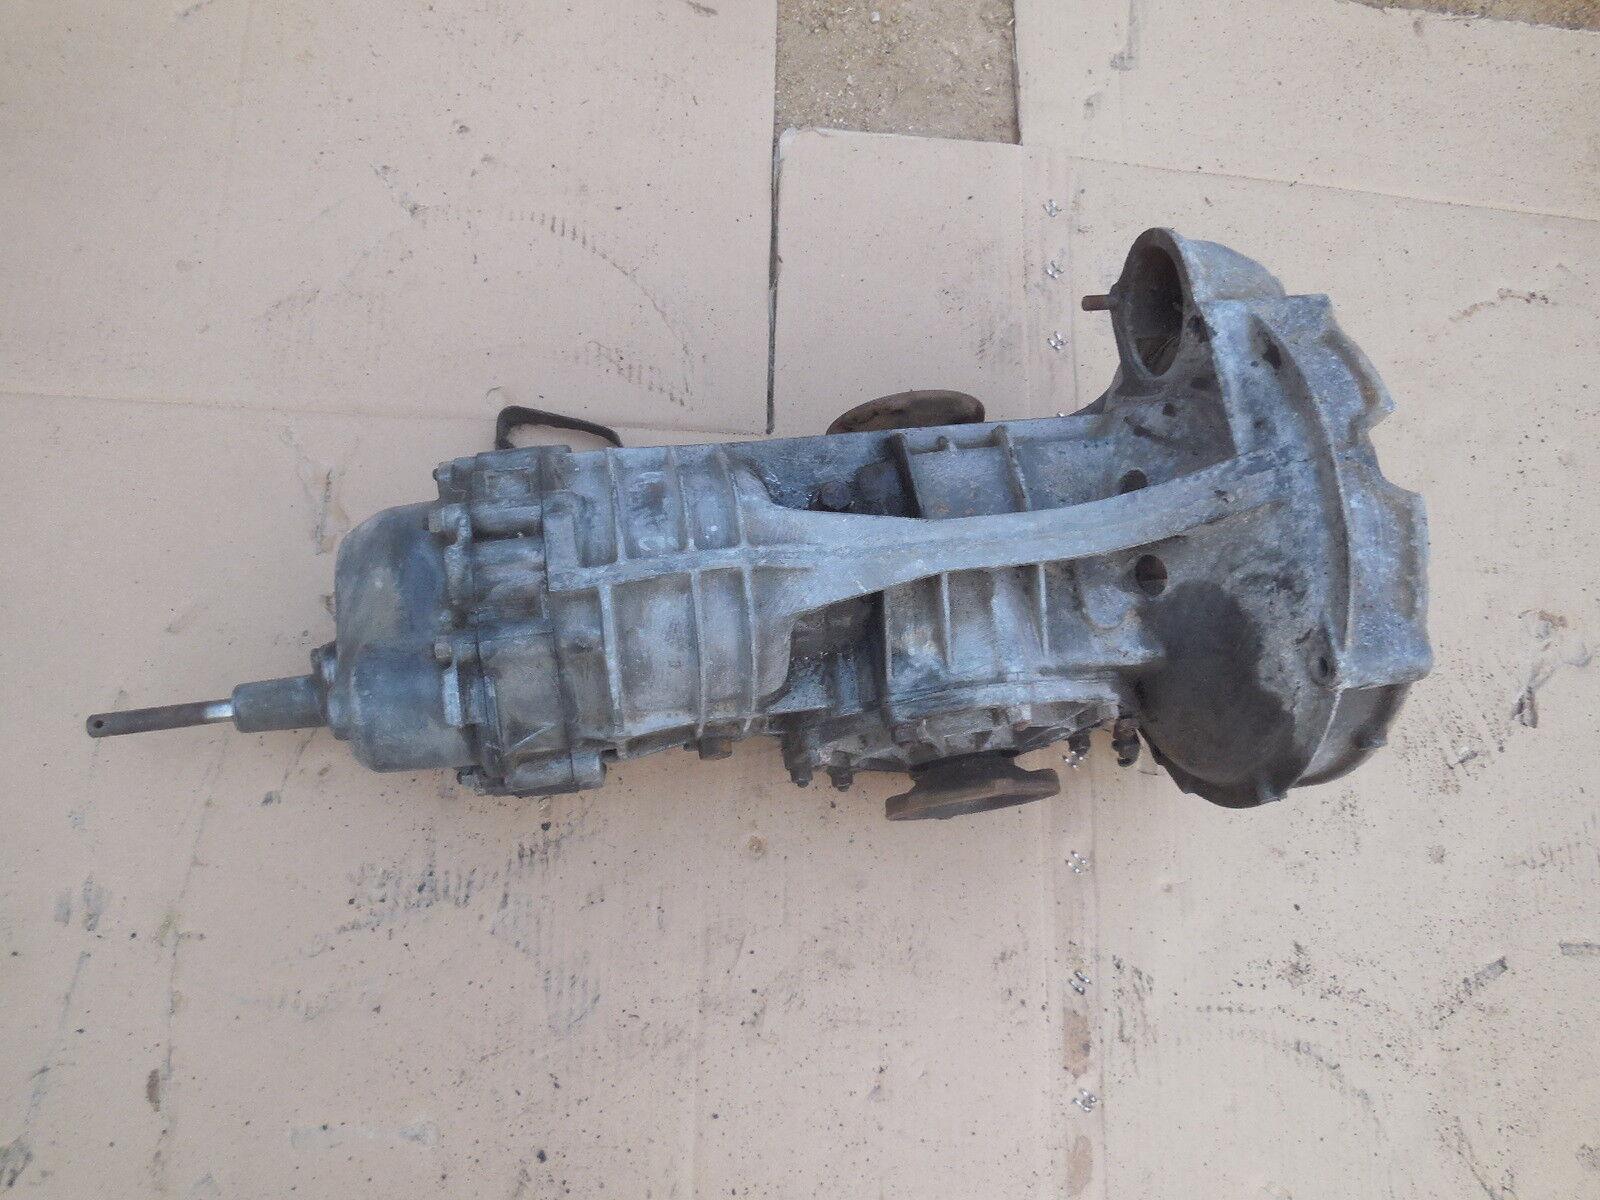 Porsche 911 E / S '70 Transmission 911/01  7117499    5 speed    # FL